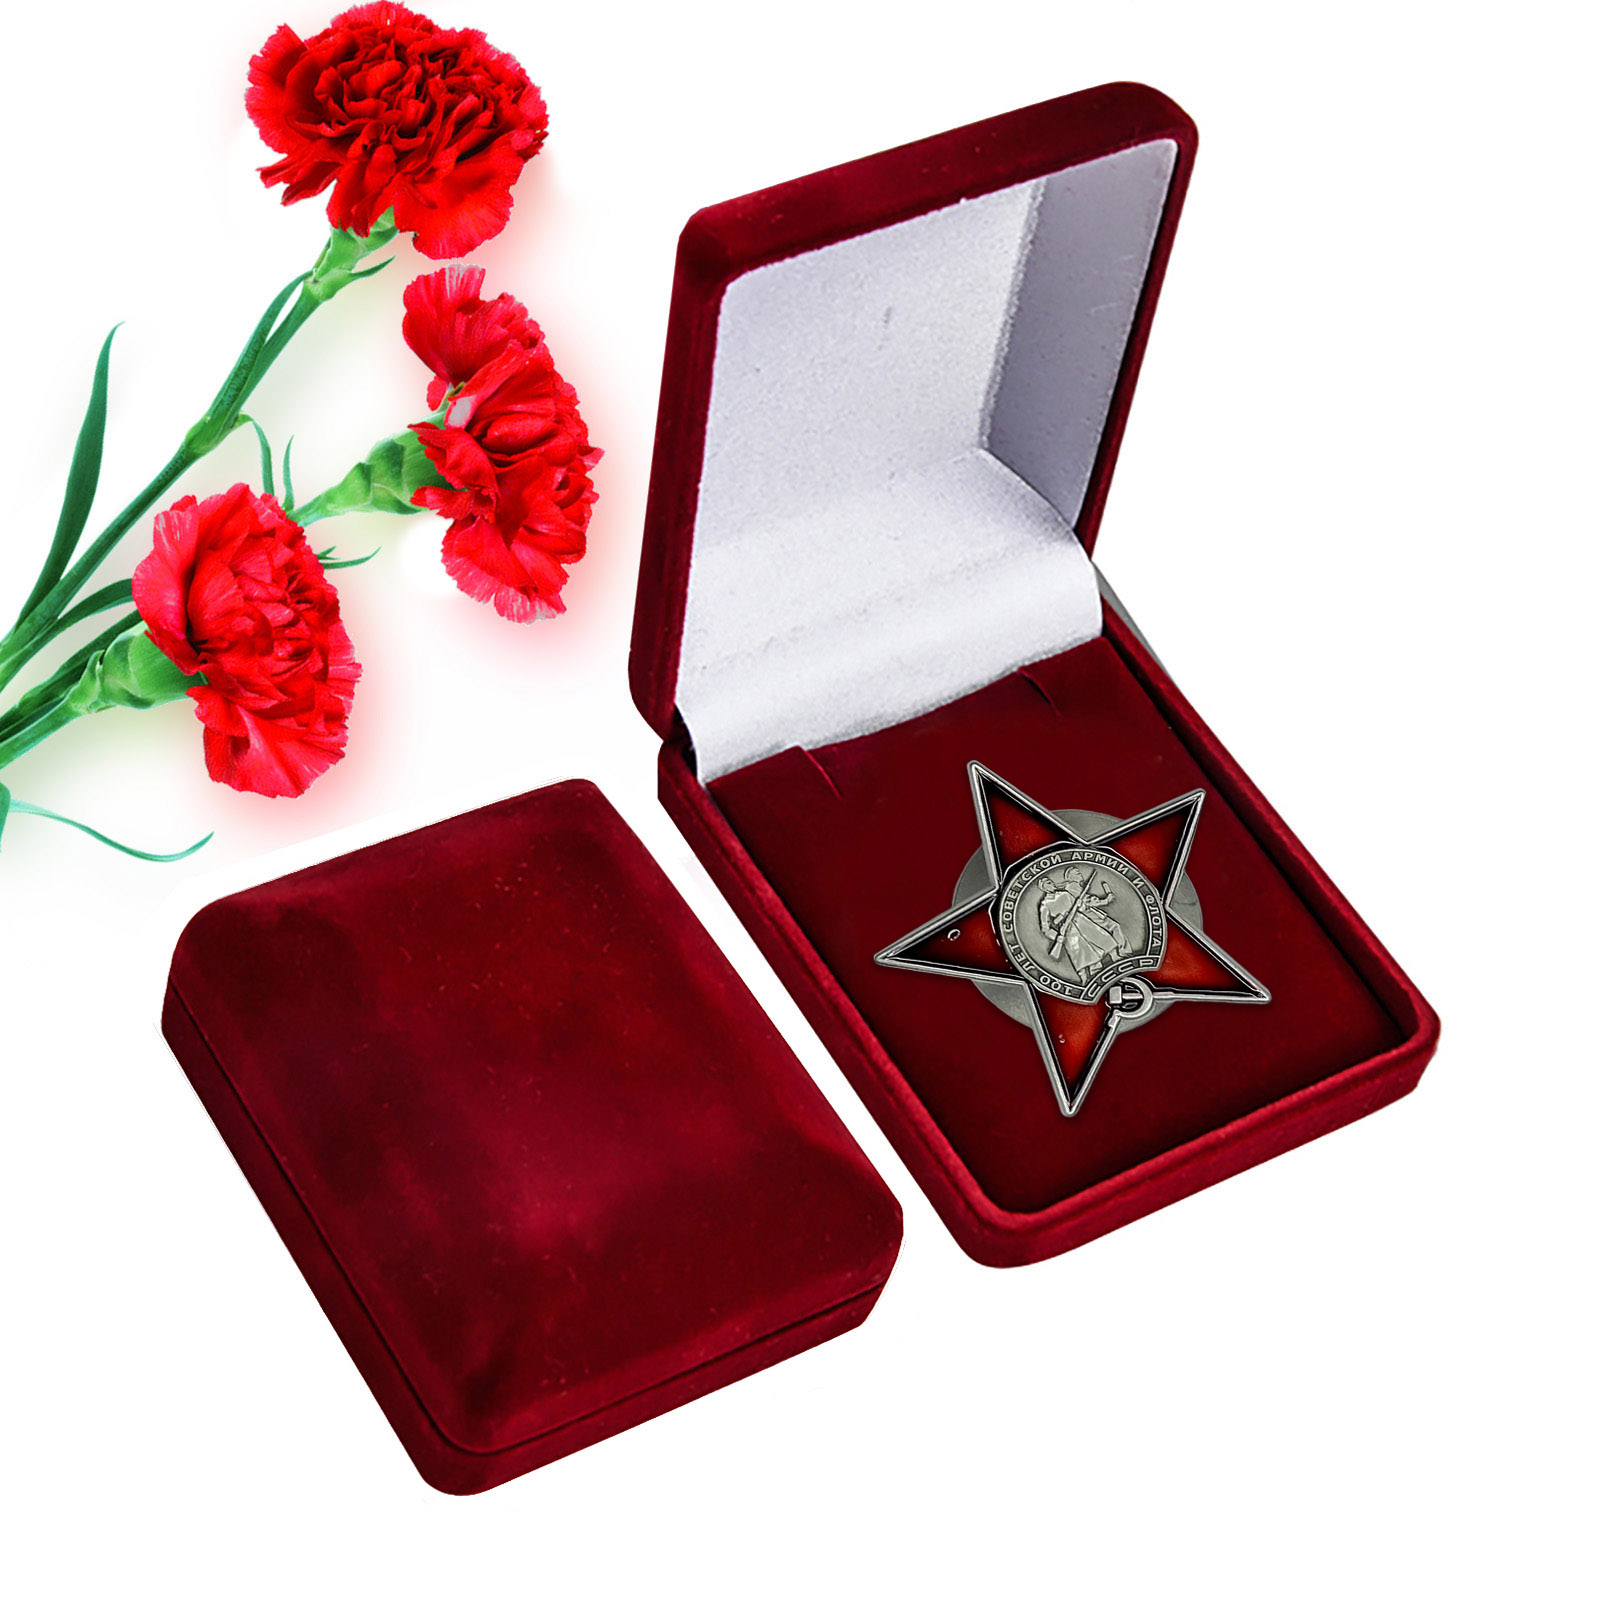 "Орден ""100 лет Армии и Флоту"" для коллекций"